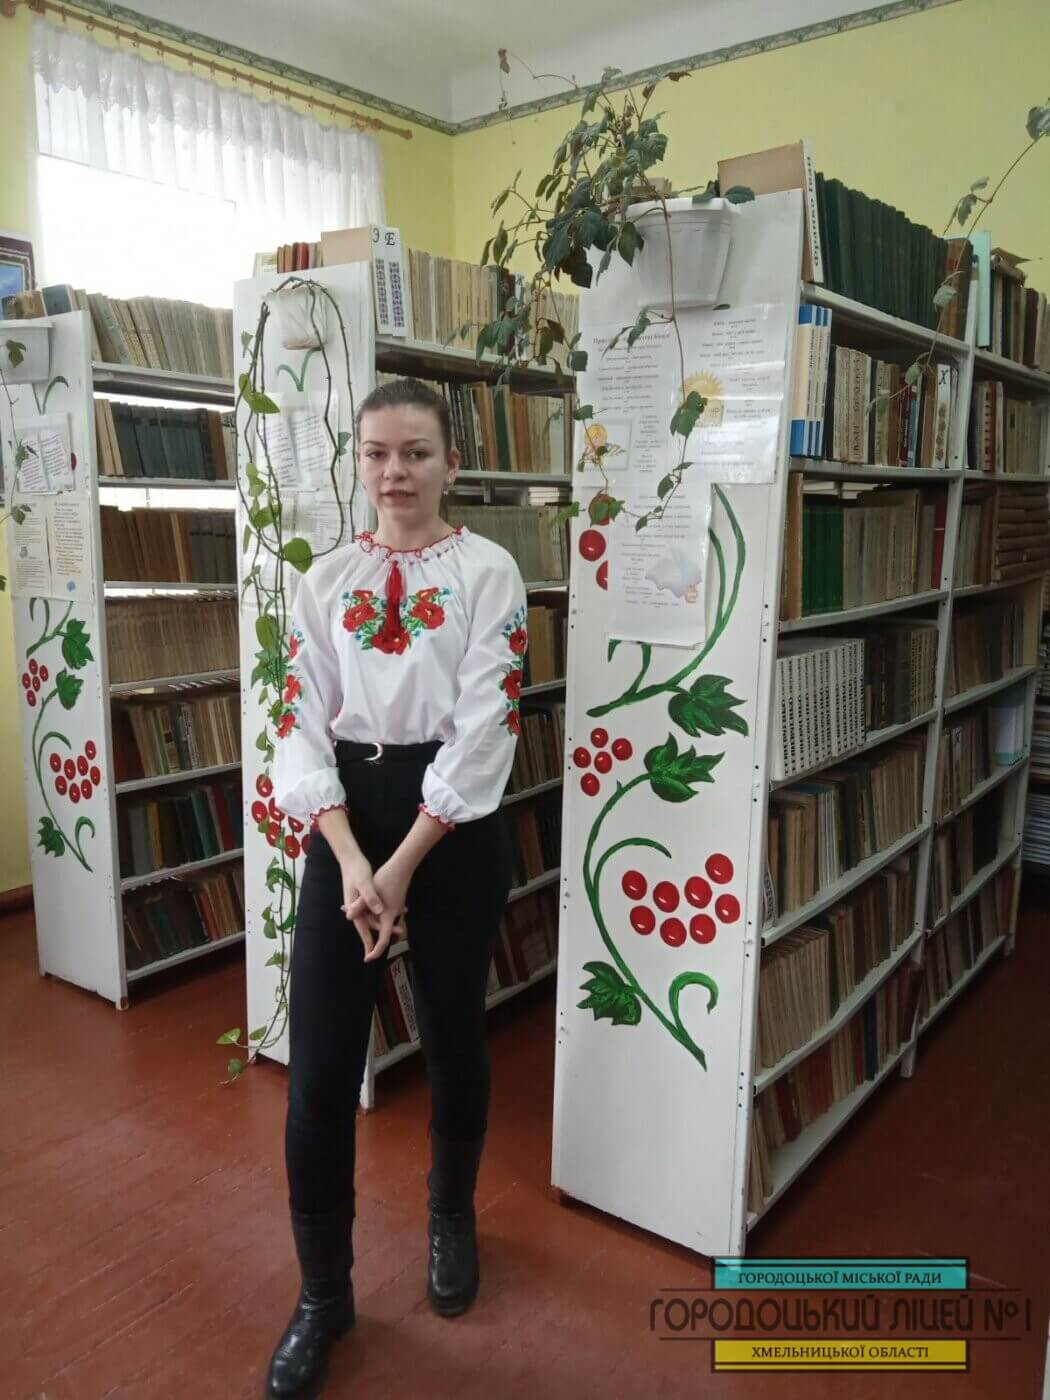 zobrazhennya viber 2021 01 25 13 57 145 1050x1400 - Велична і Соборна, моя ти Україно!